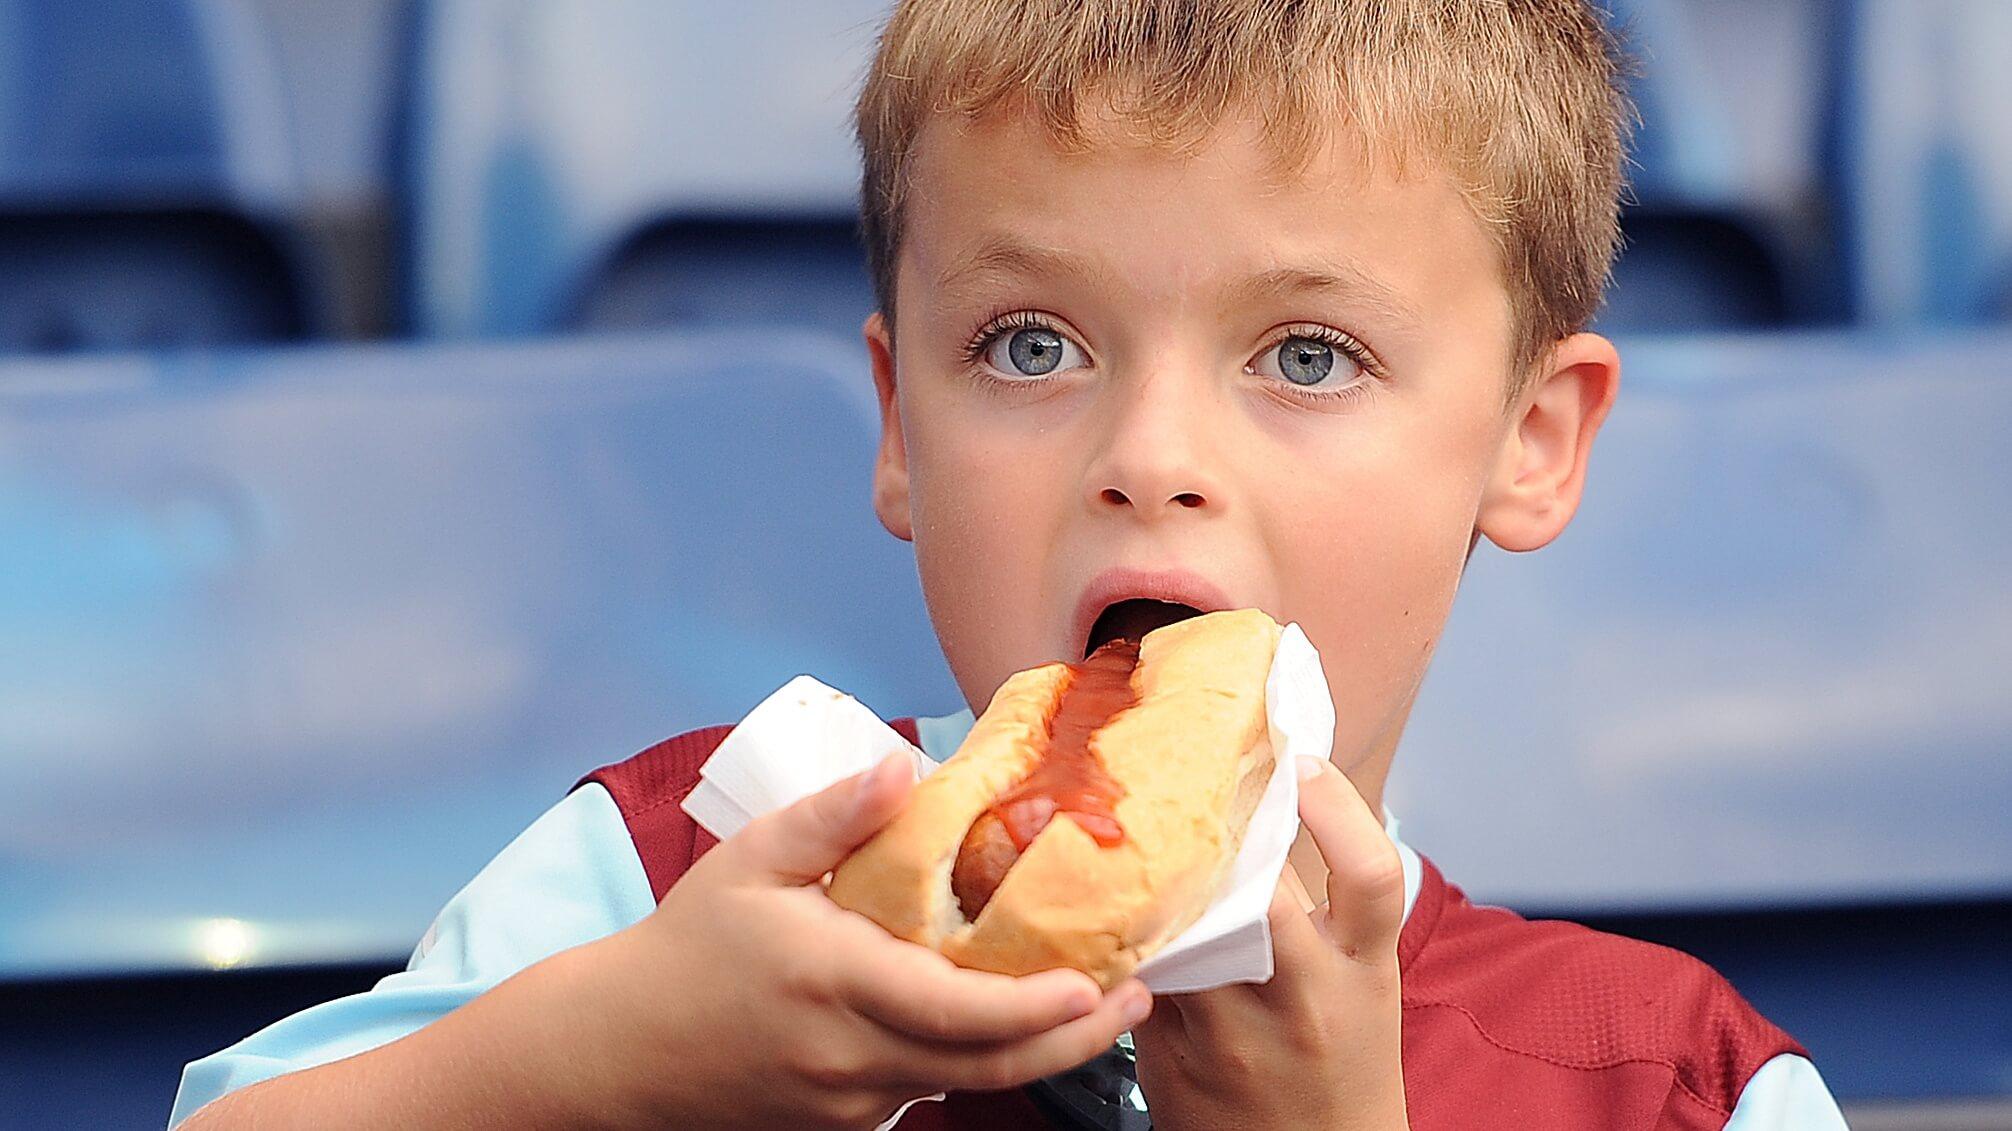 UK Environment Secretary Michael Gove Urges Football Stadiums to Add Vegan Menu Items for the Planet